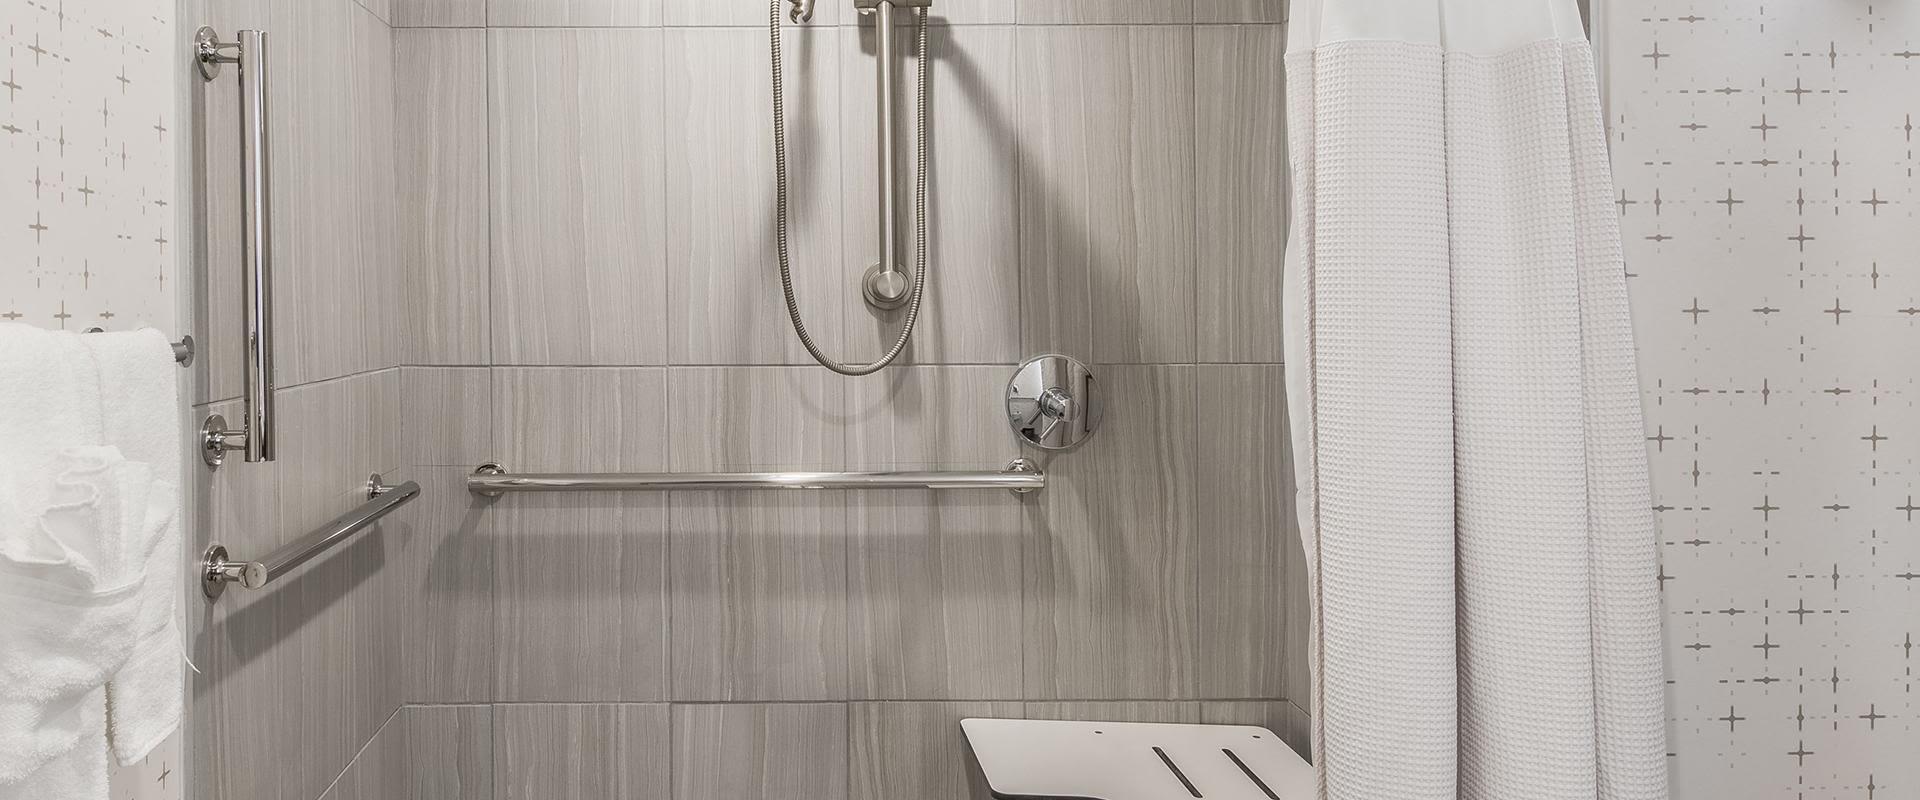 Denver Accessible Bathroom Roll In Shower